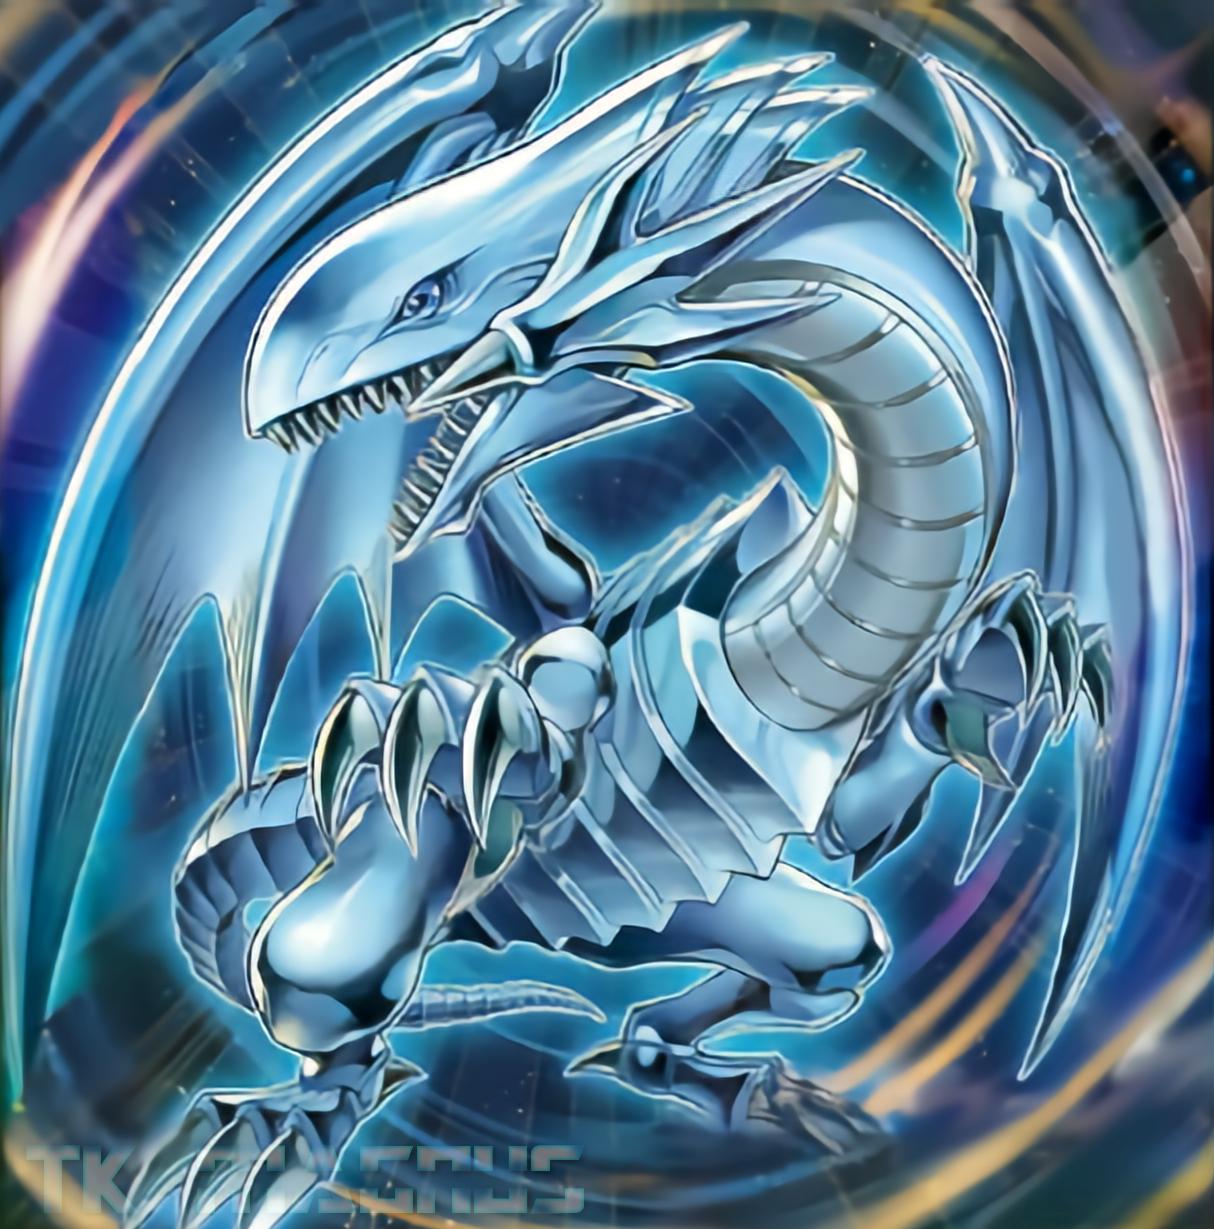 Blue Eyes White Dragon Rush Duel Clean Art By Tkhan1 On Deviantart Yugioh Dragon Cards Yugioh Dragons White Dragon